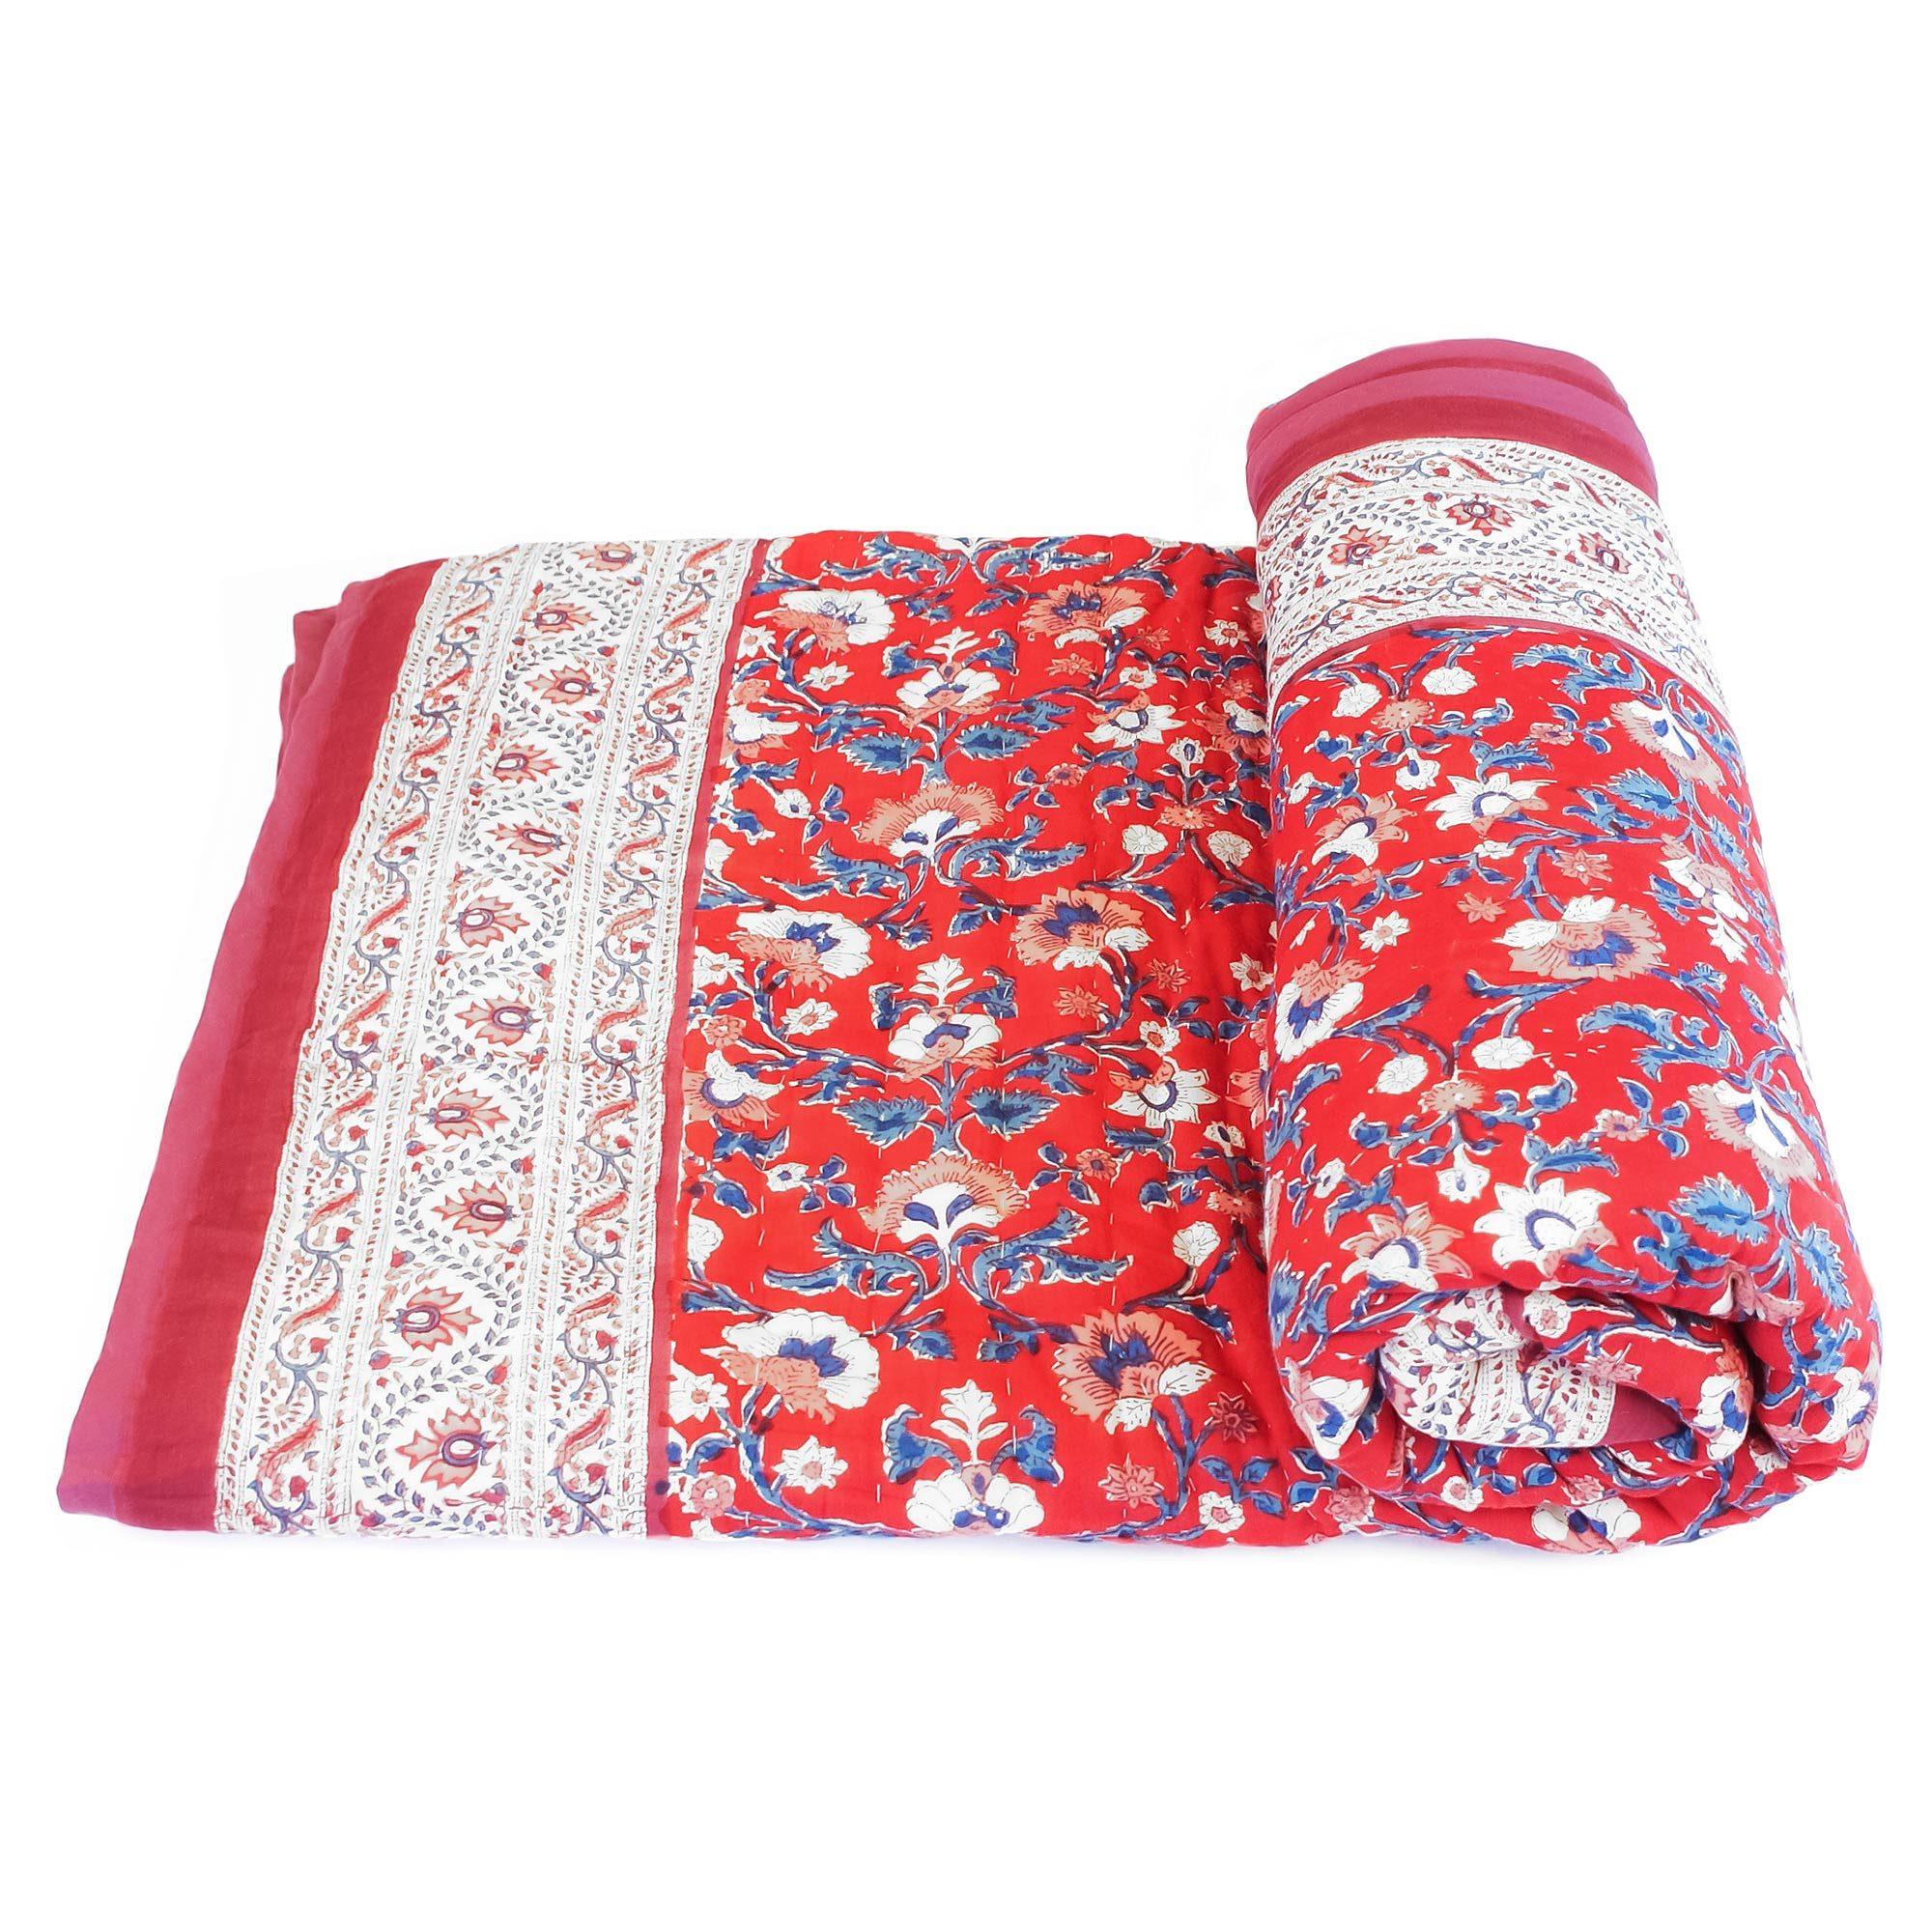 Tara-Textile - indische Decke - Kuscheldecke Rinara